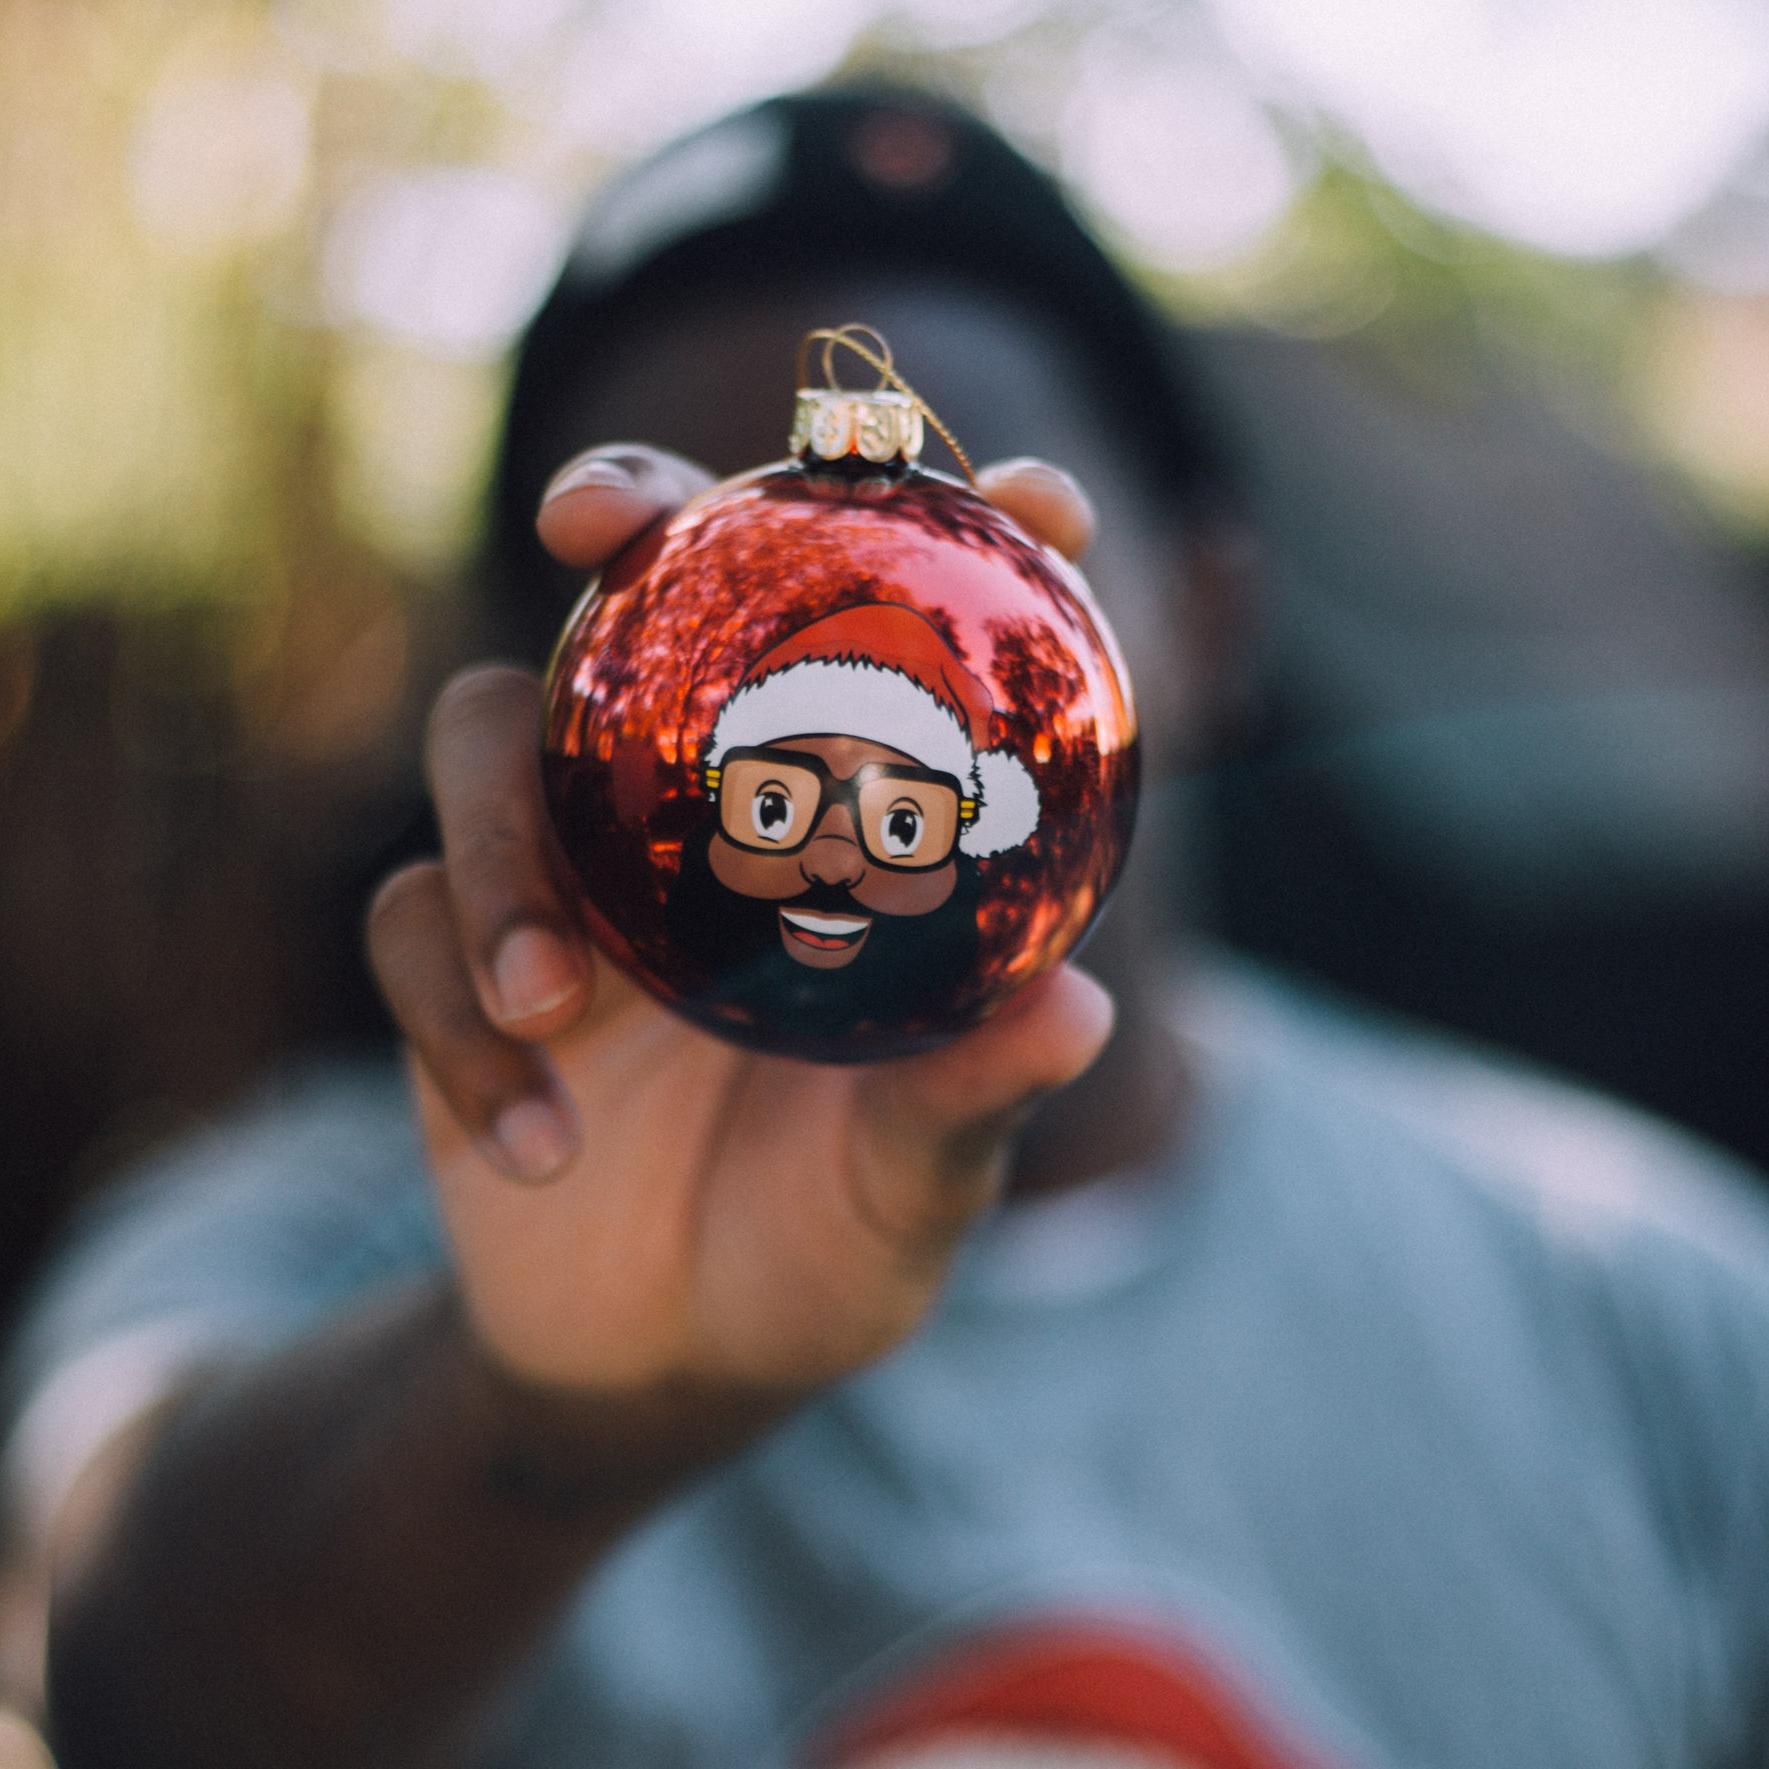 Holding Ornament.jpg